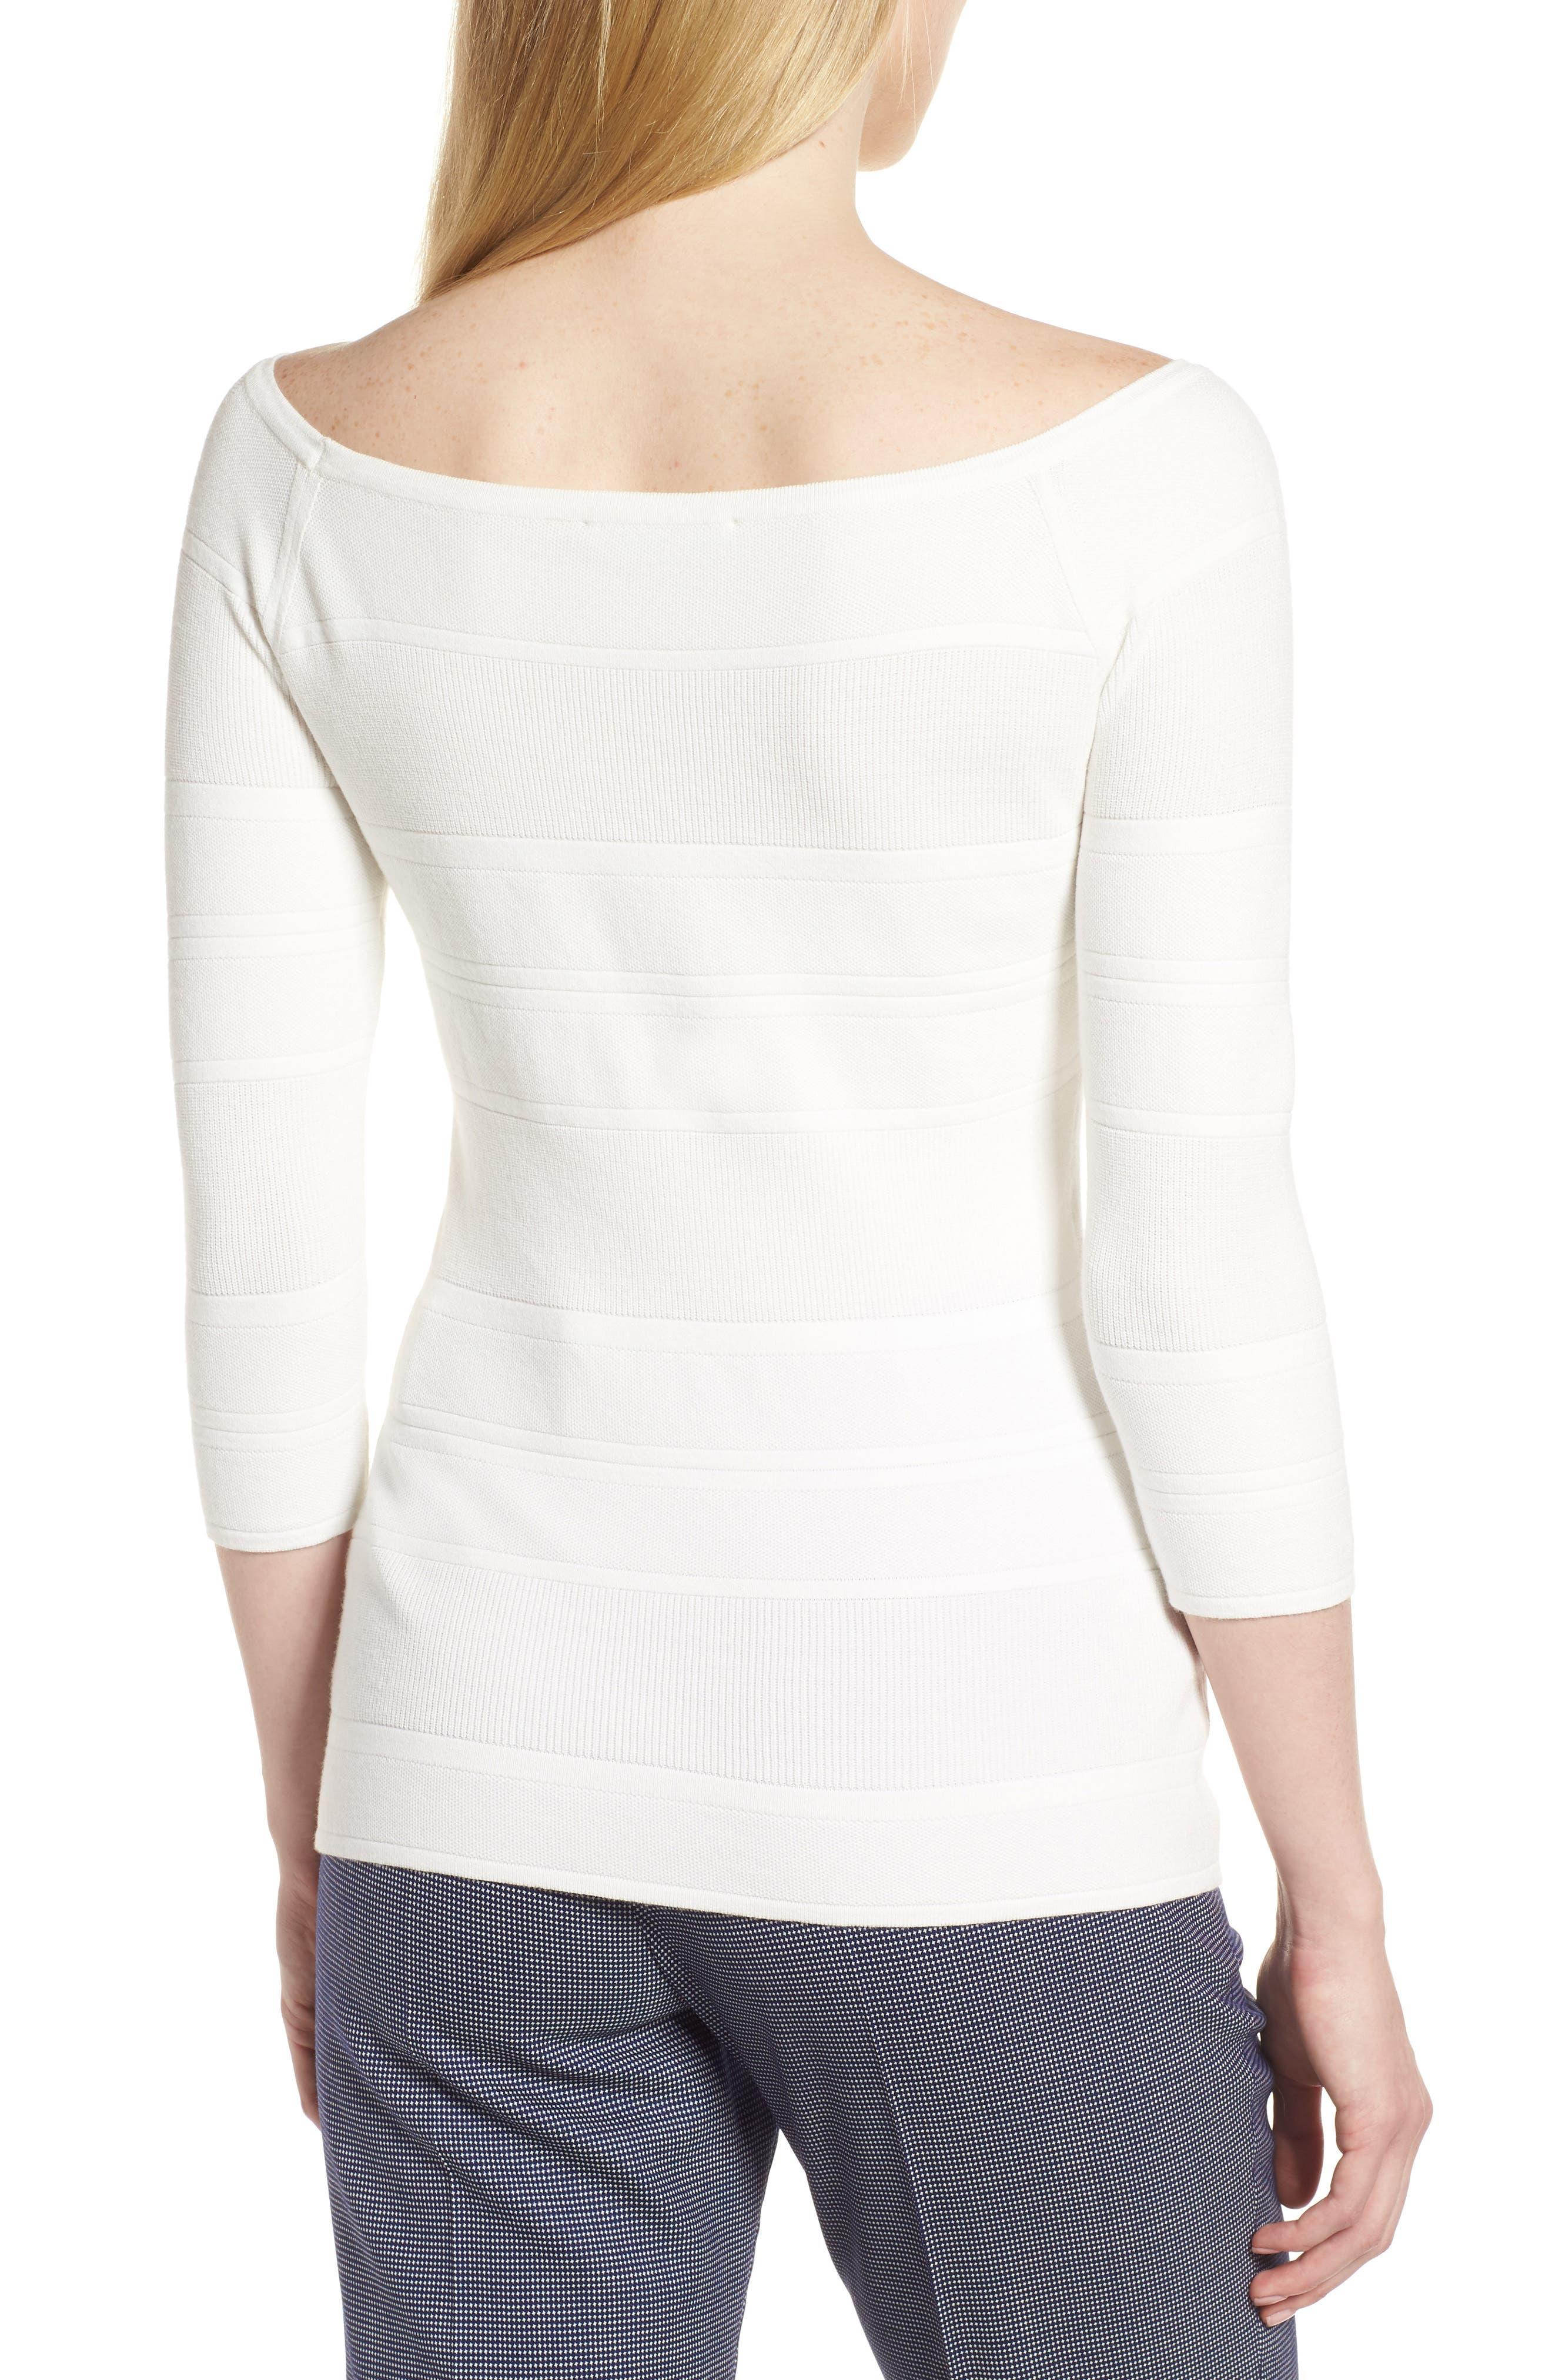 Finami Sweater,                             Alternate thumbnail 2, color,                             White